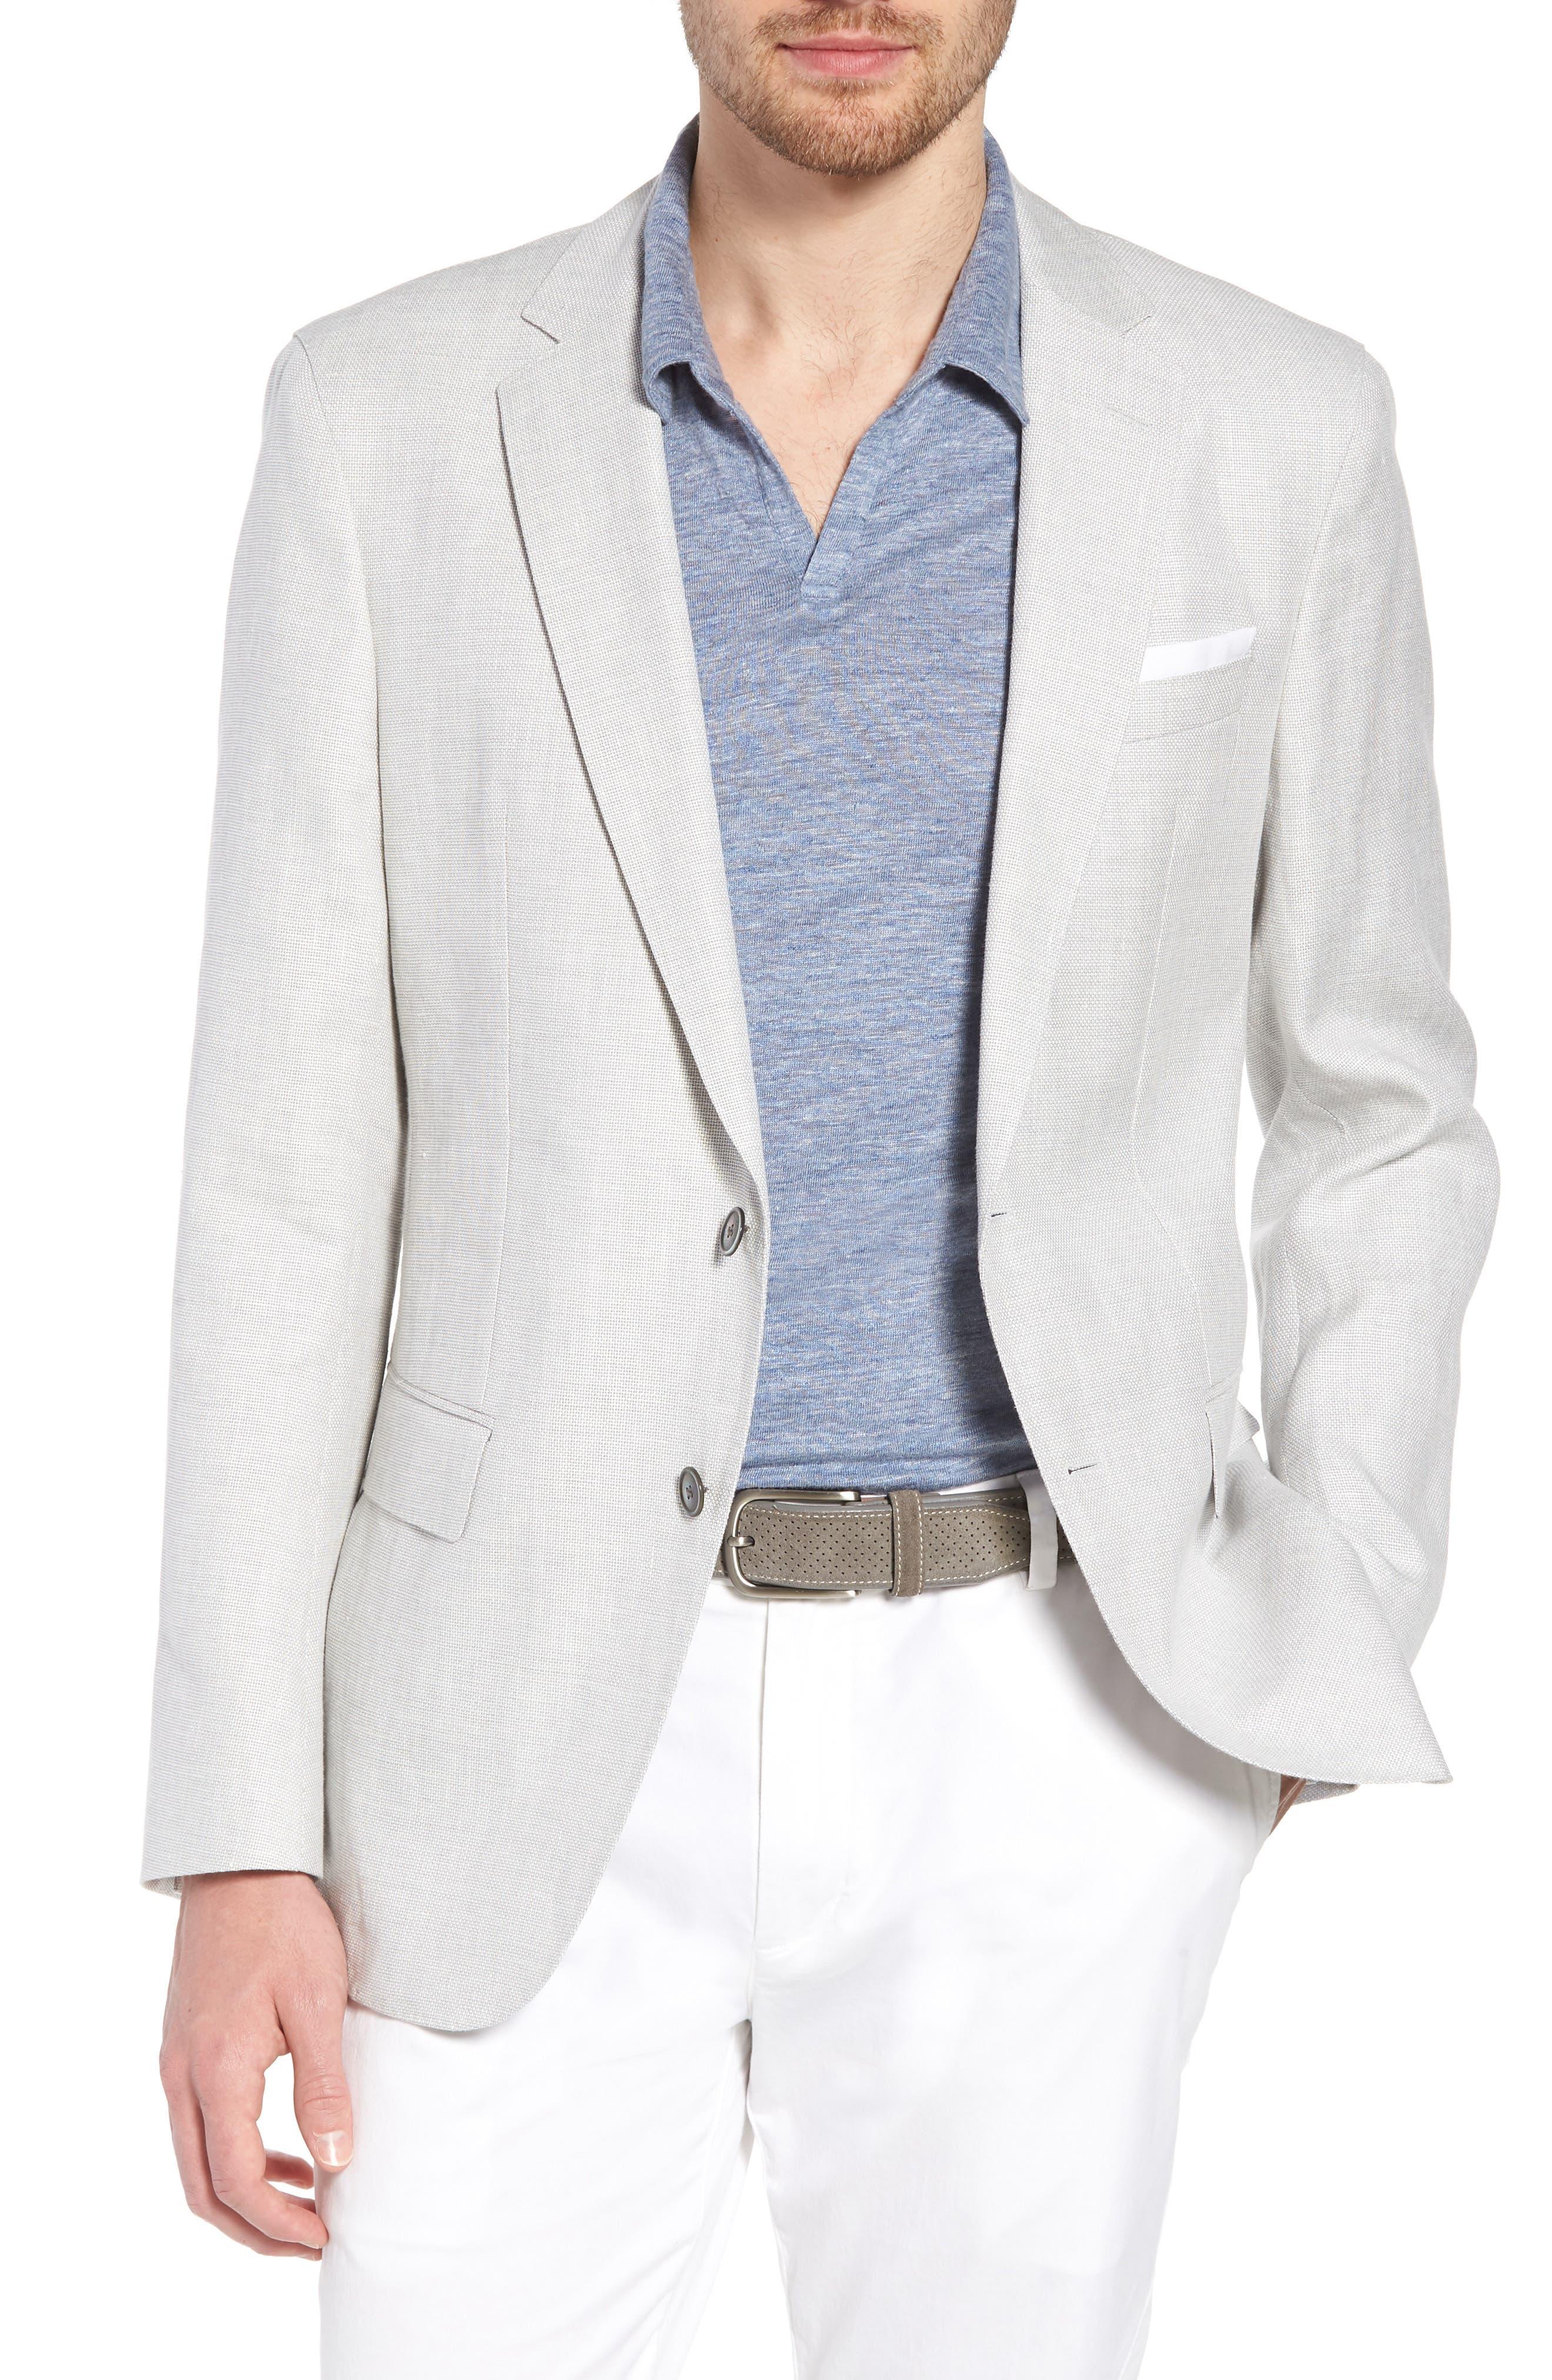 Hartlay Trim Fit Linen Blend Blazer,                             Main thumbnail 1, color,                             Silver Grey